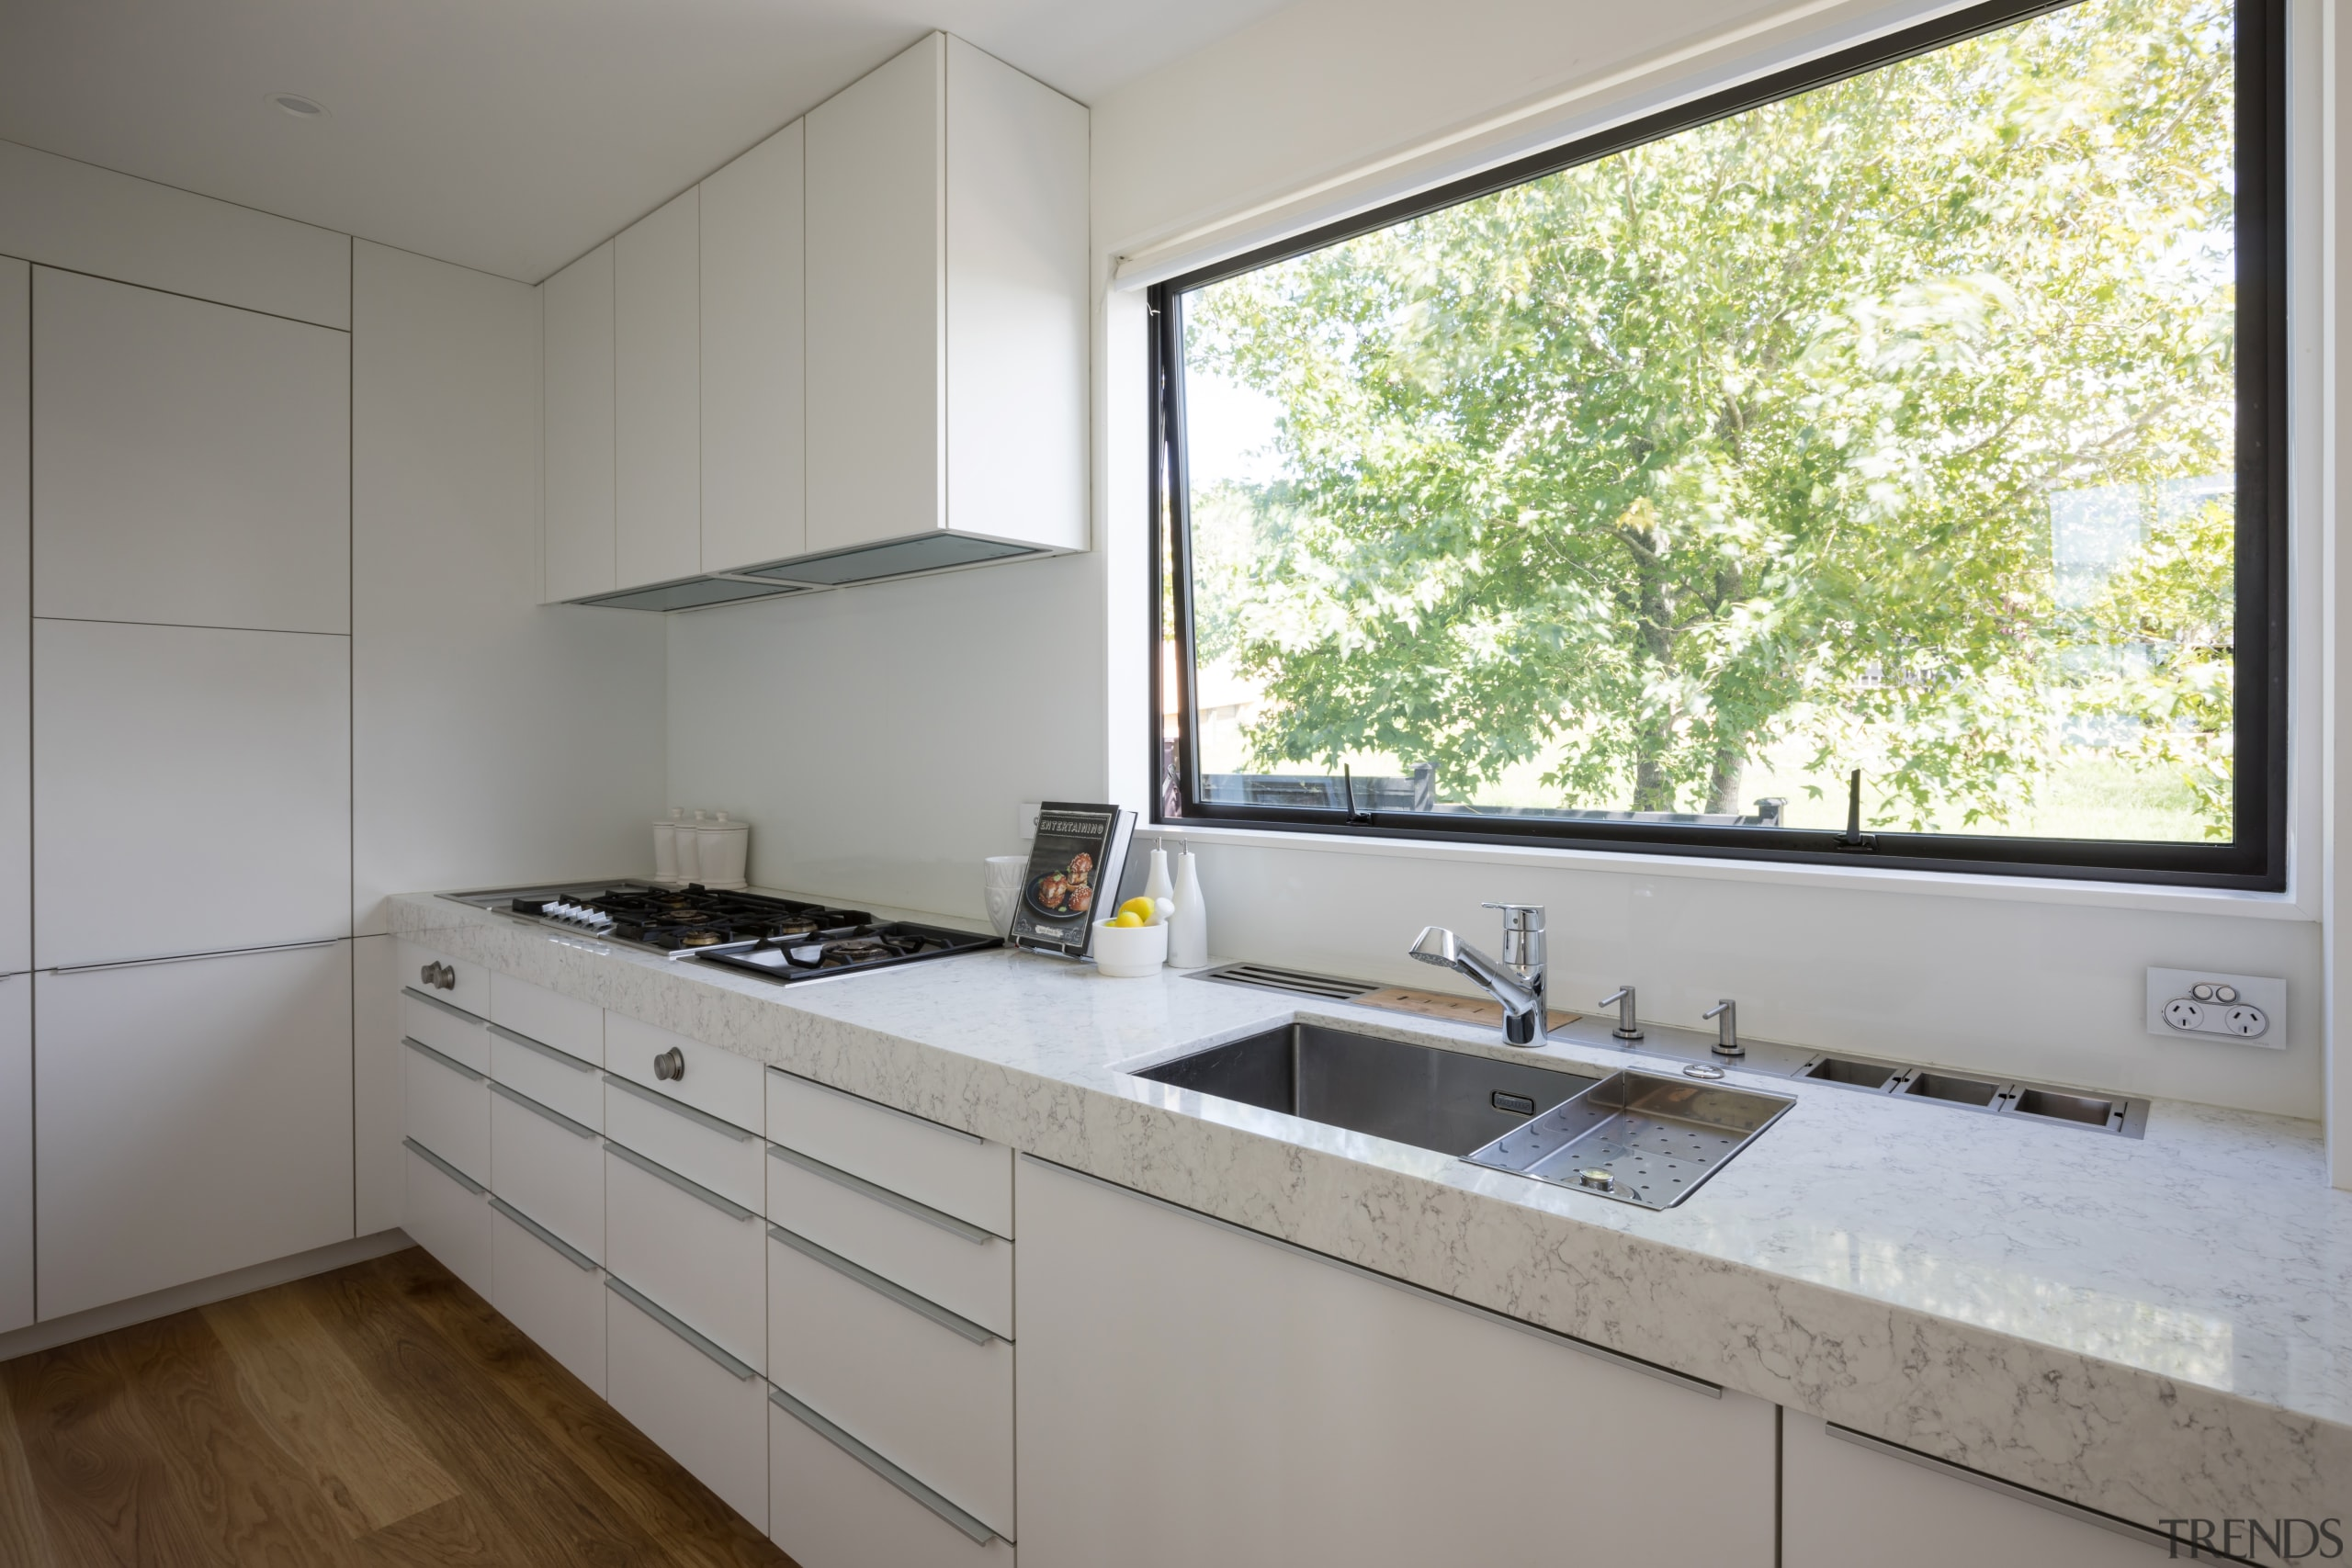 Room at the back – this modern kitchen architecture, cabinetry, countertop, scullery, storage, appliances, Poggenpohl, Akzente, Lara Farmilo